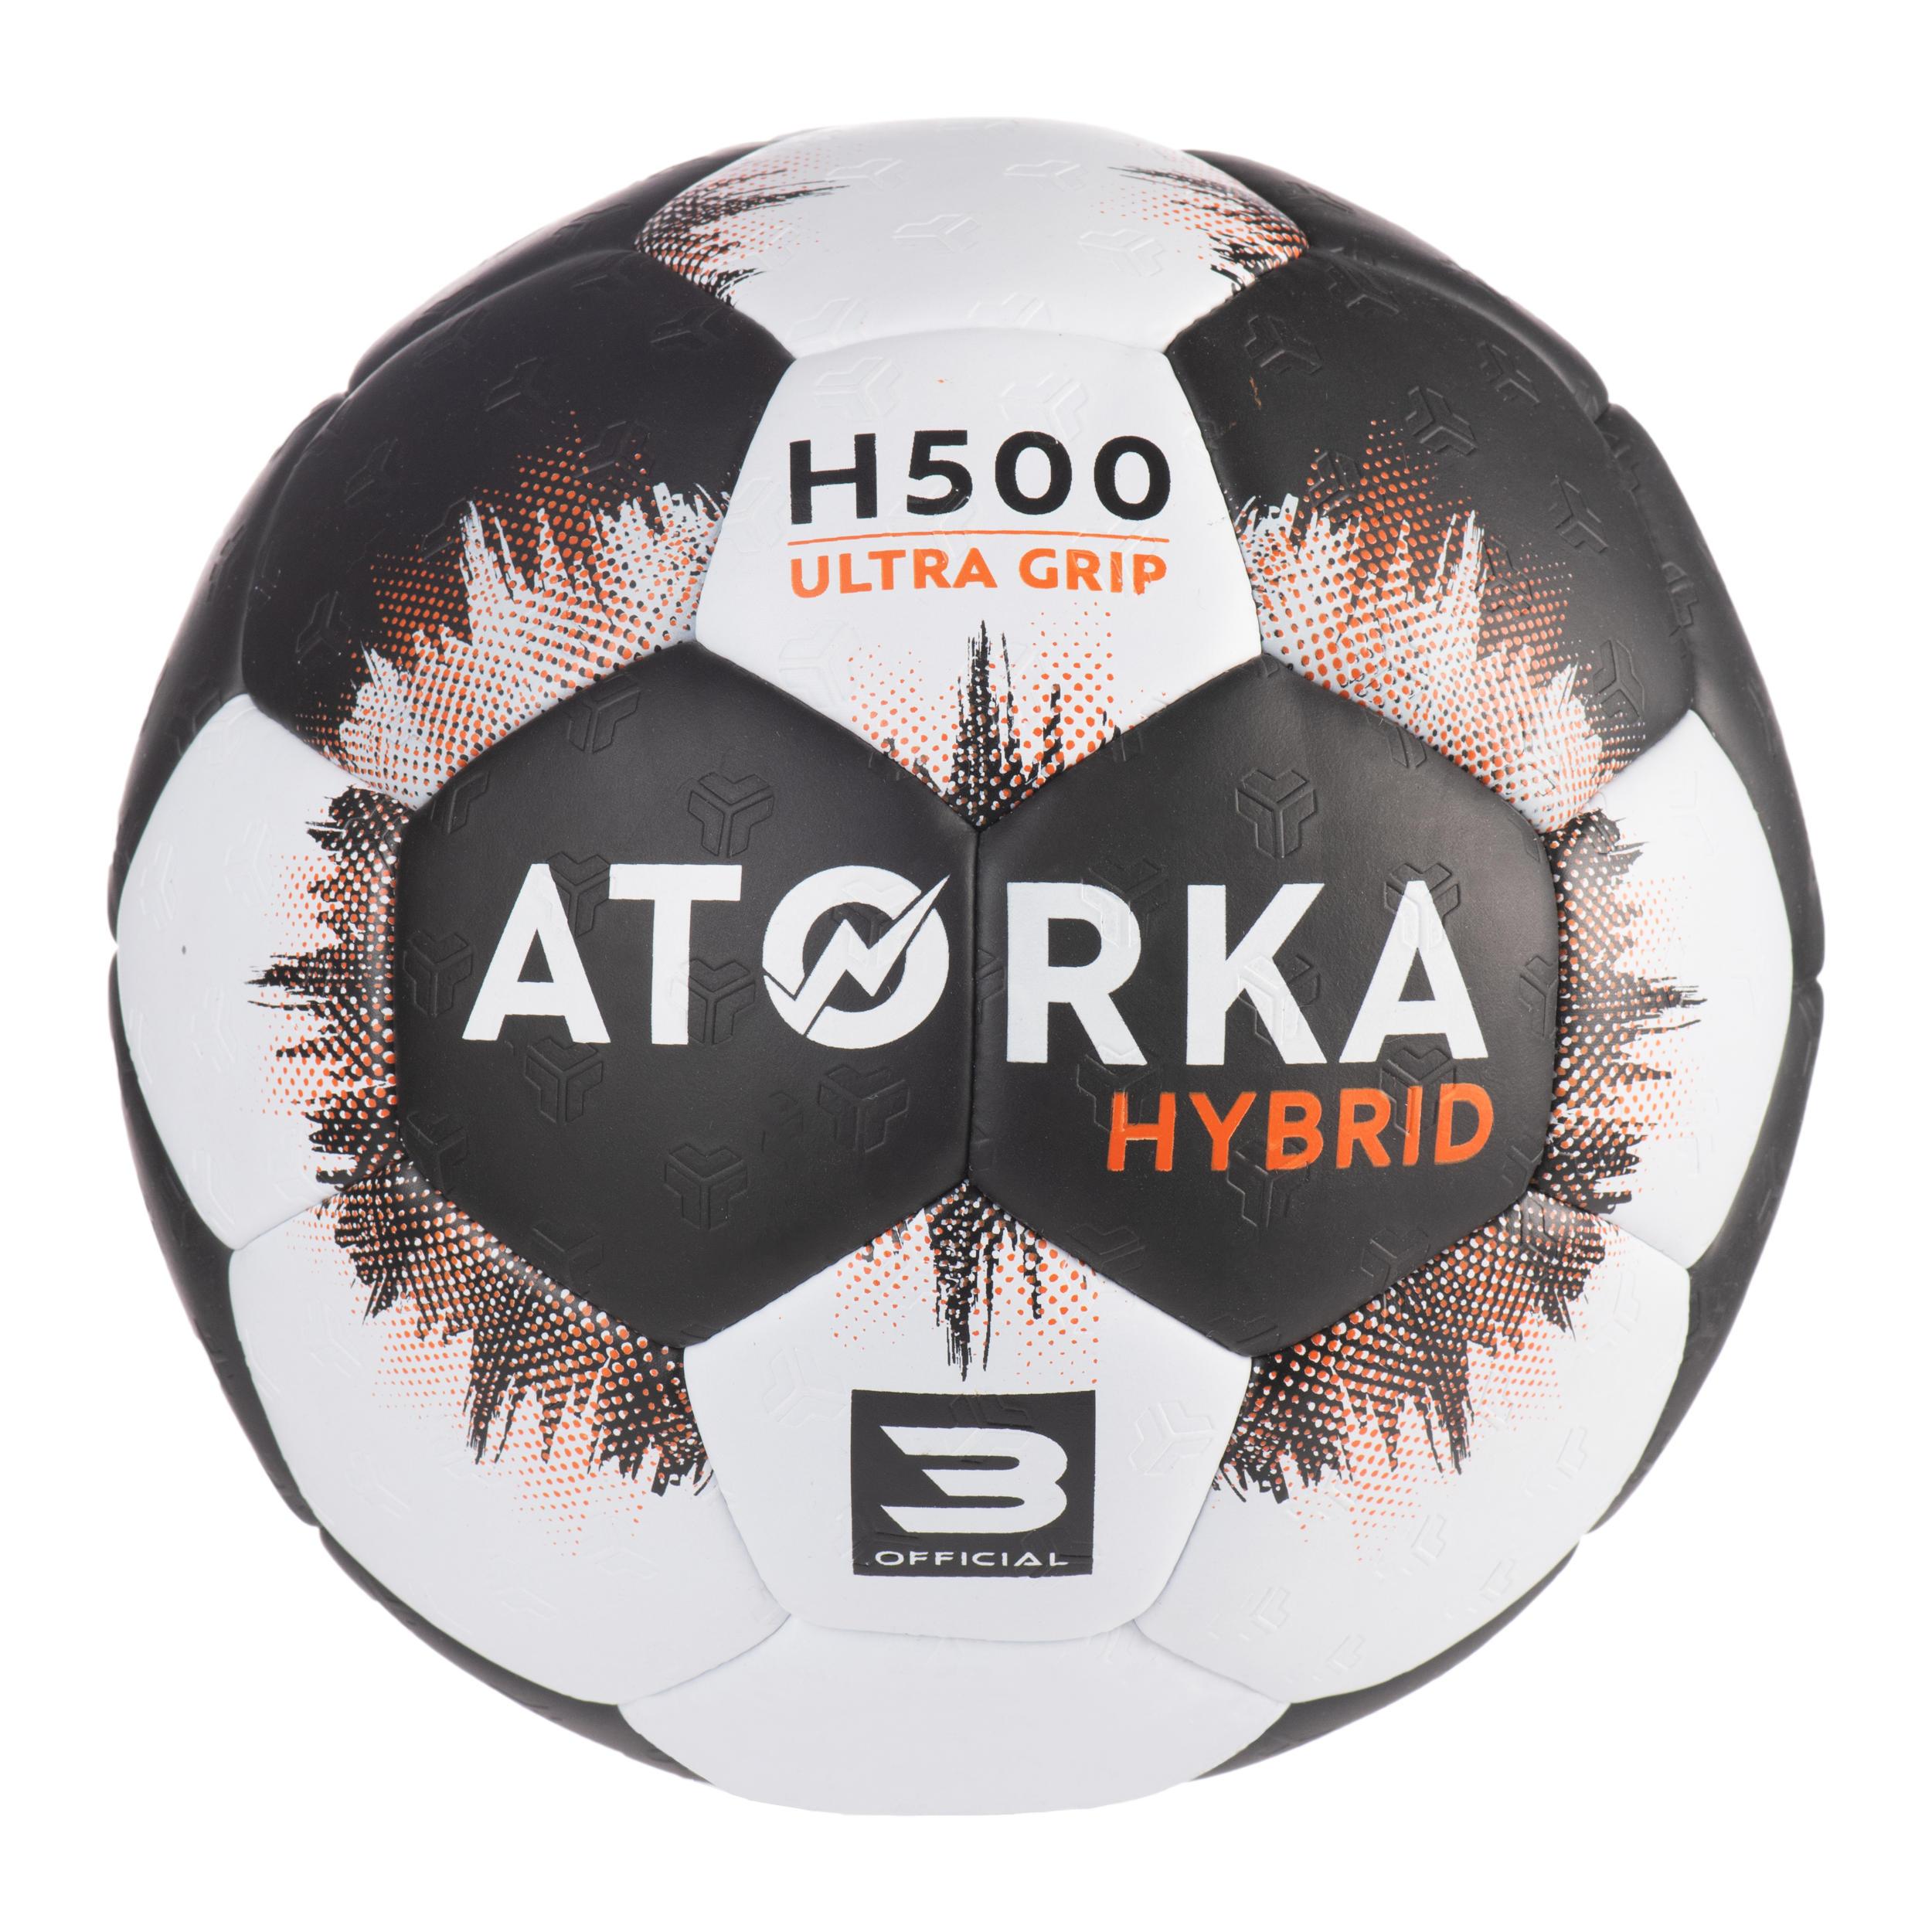 Minge Handbal H500 Mărimea 3 la Reducere poza